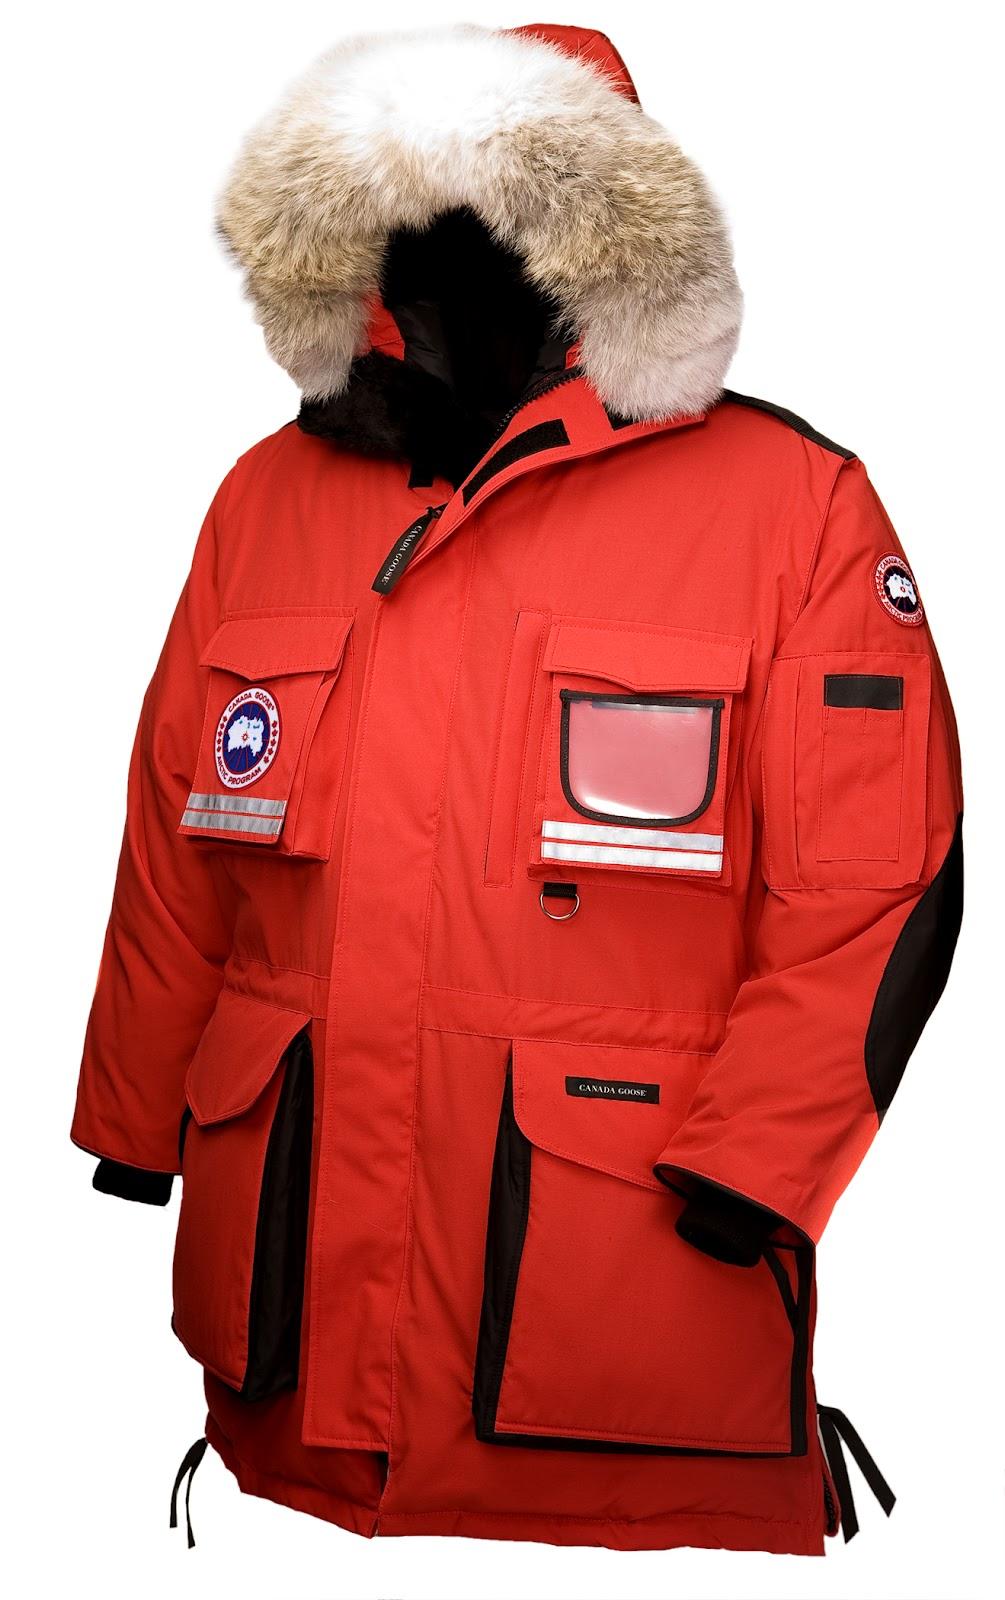 Canada Goose toronto online discounts - CANADA GOOSE >>> BRAVE THE ELEMENTS / 14 oz. store berlin